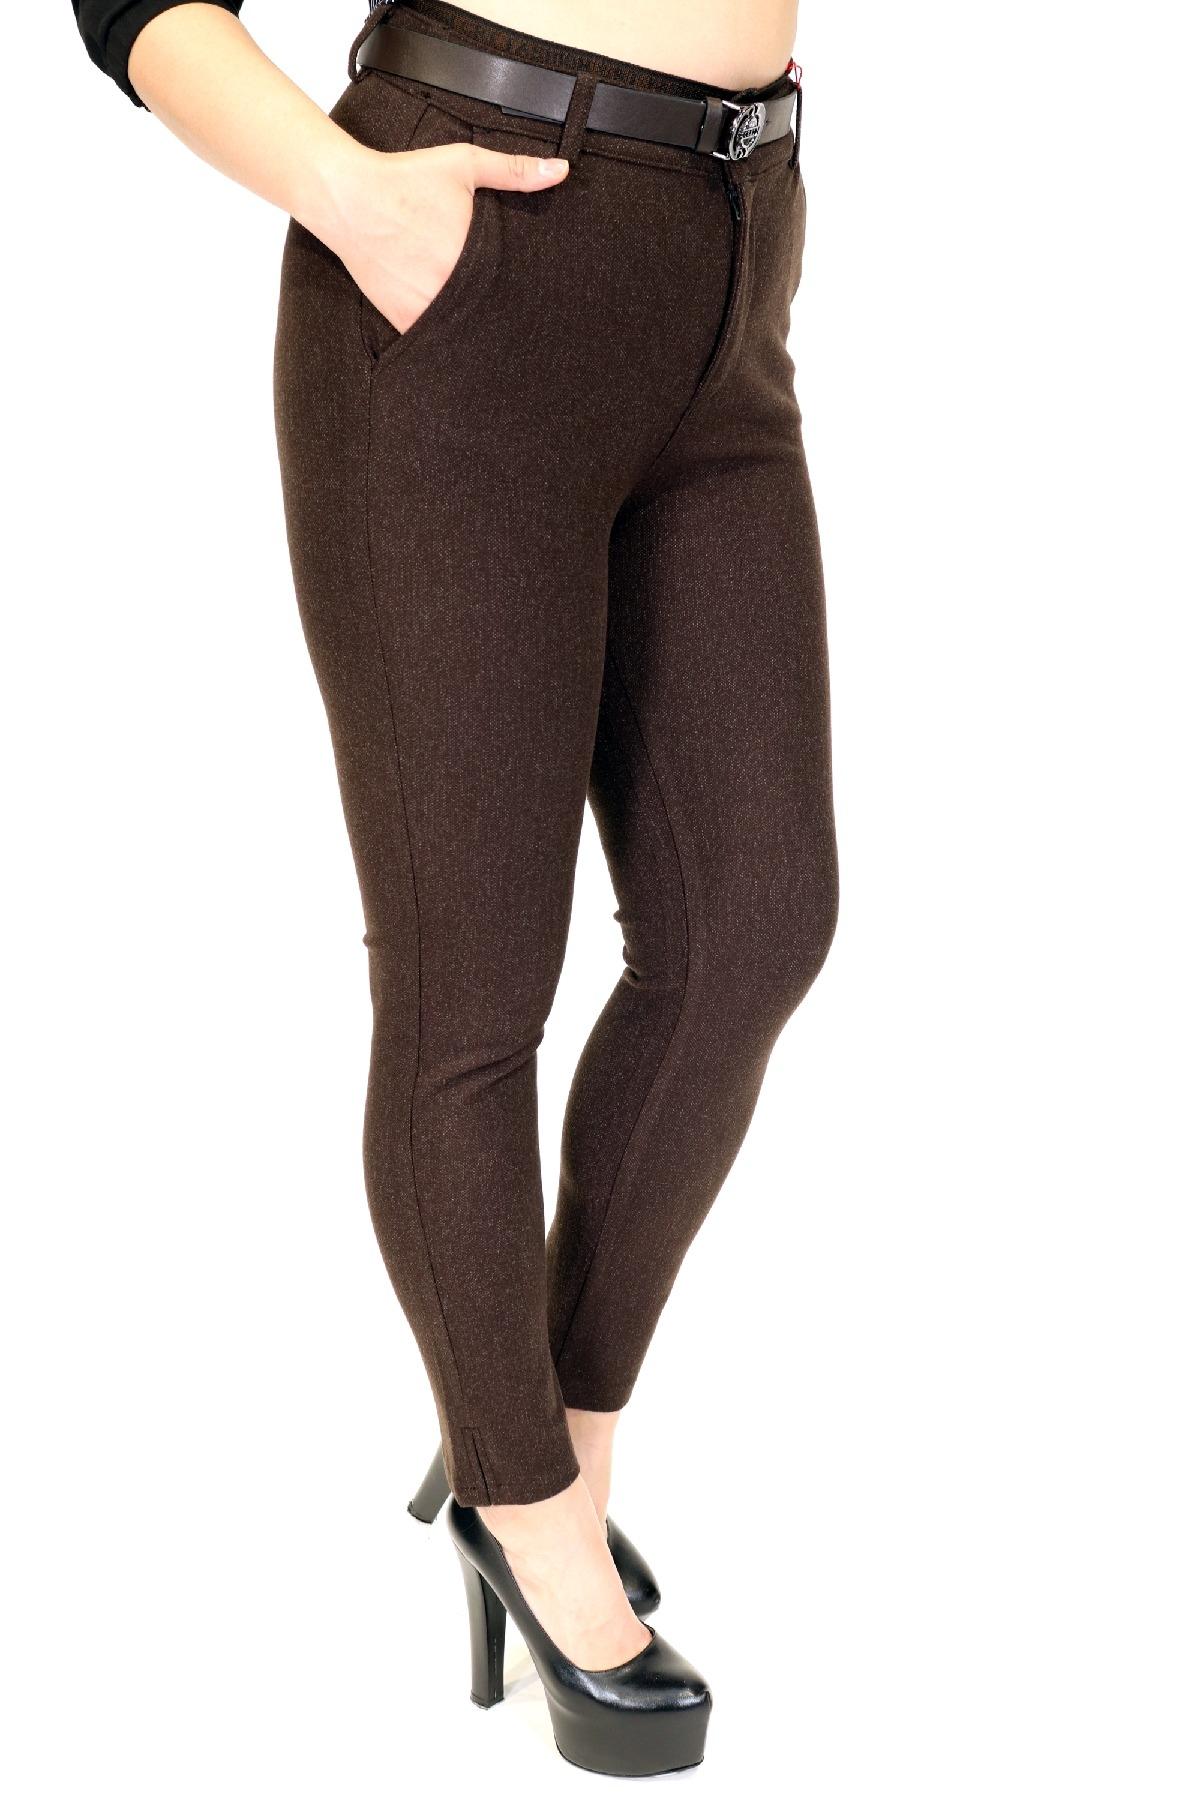 women pants-Brown